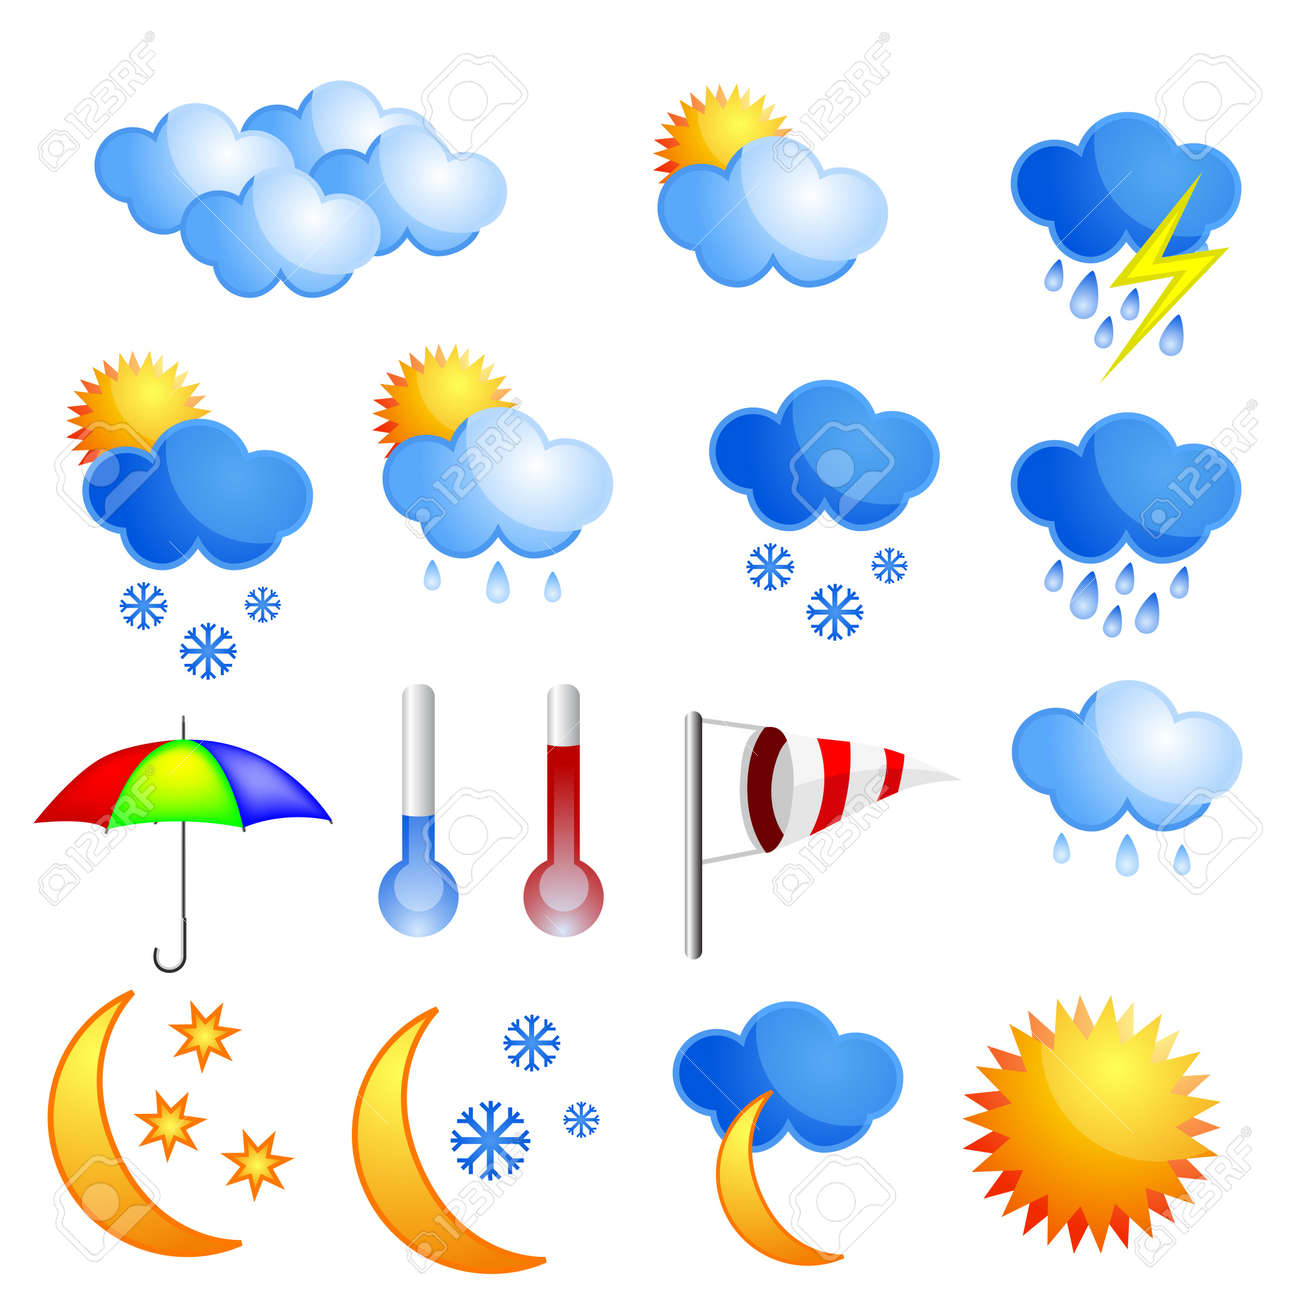 Weather icon set Stock Vector - 8779378